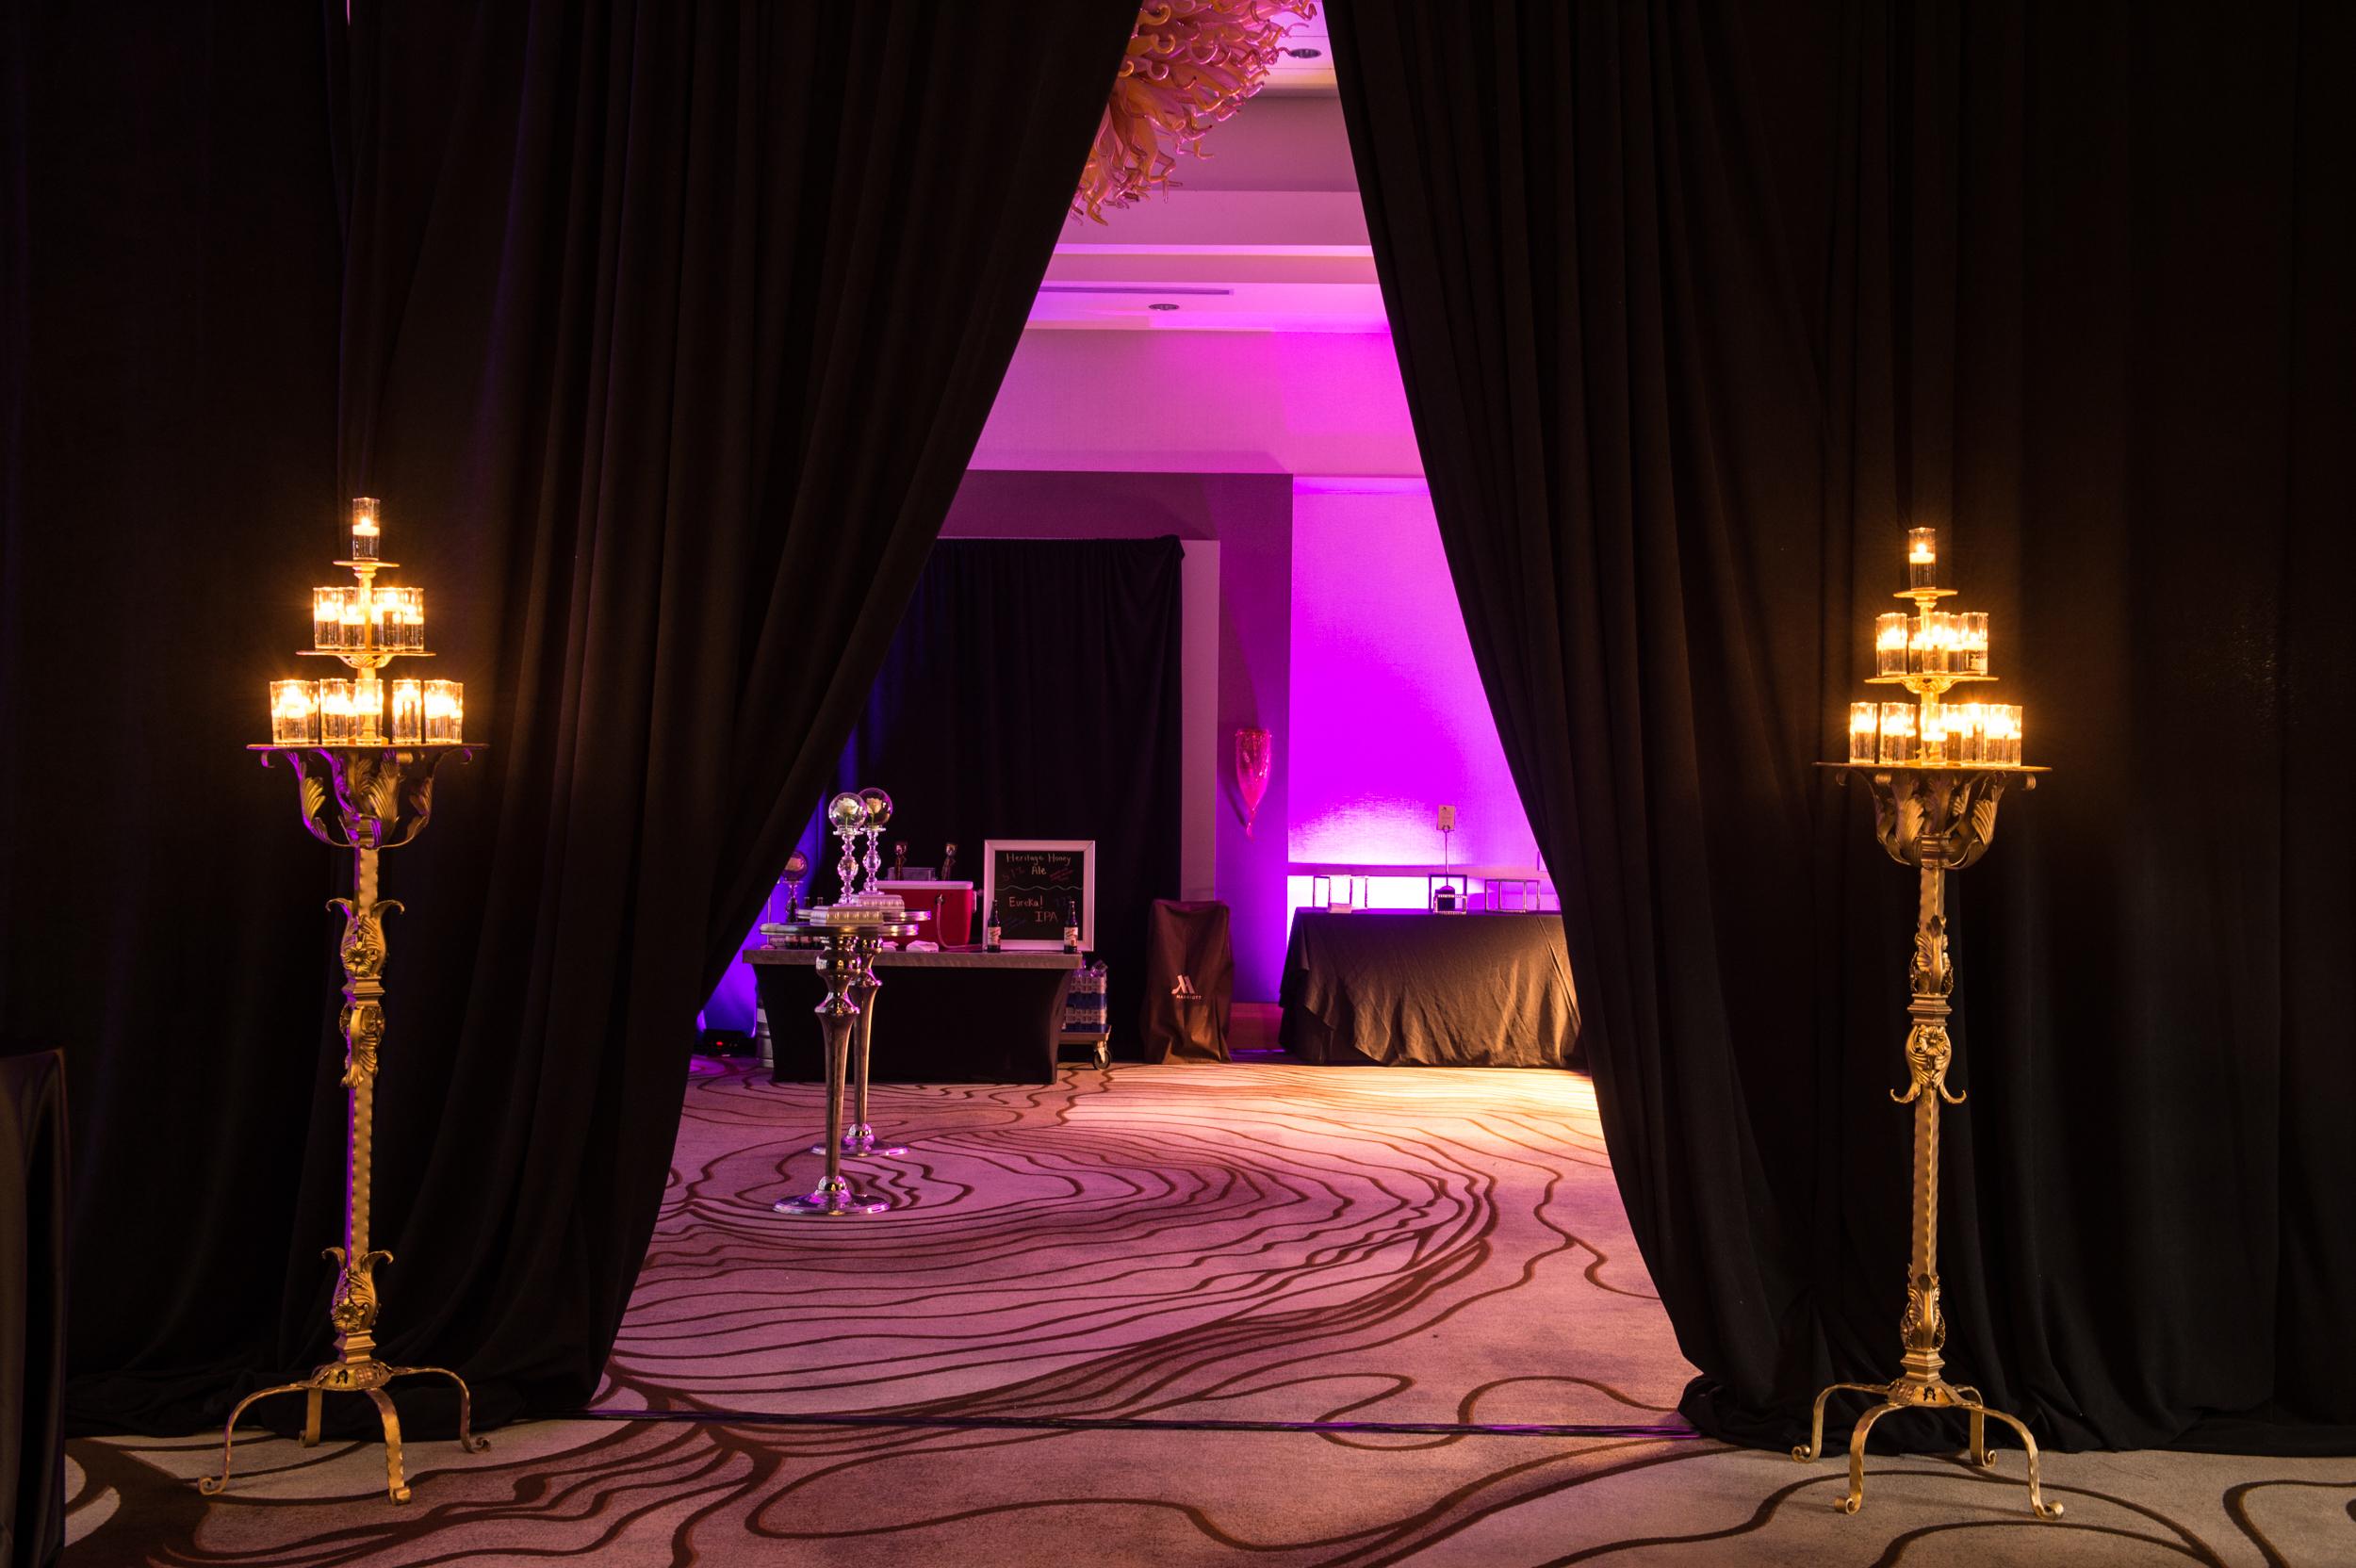 San Jose Marriott Relaunch Event - Photogenic Events